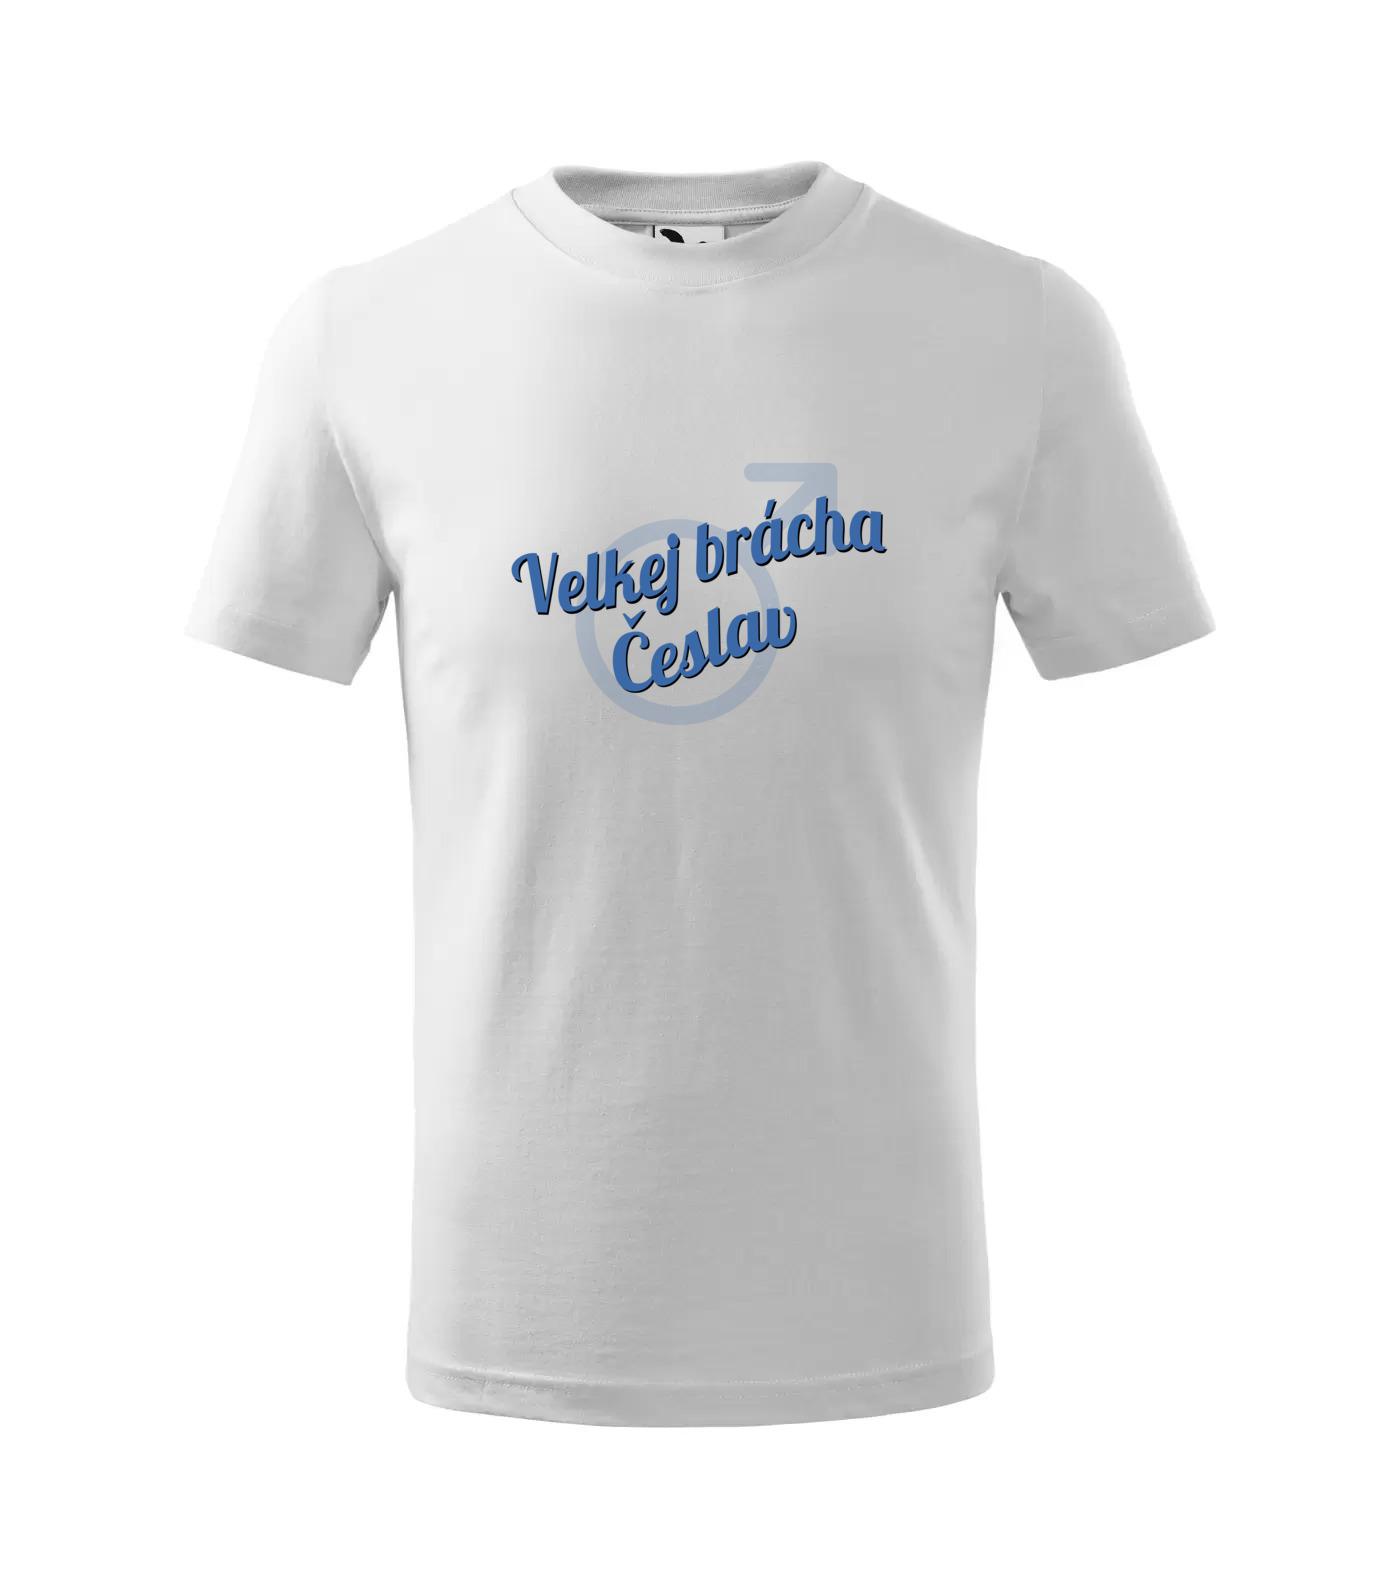 Tričko Velkej brácha velkejbracha